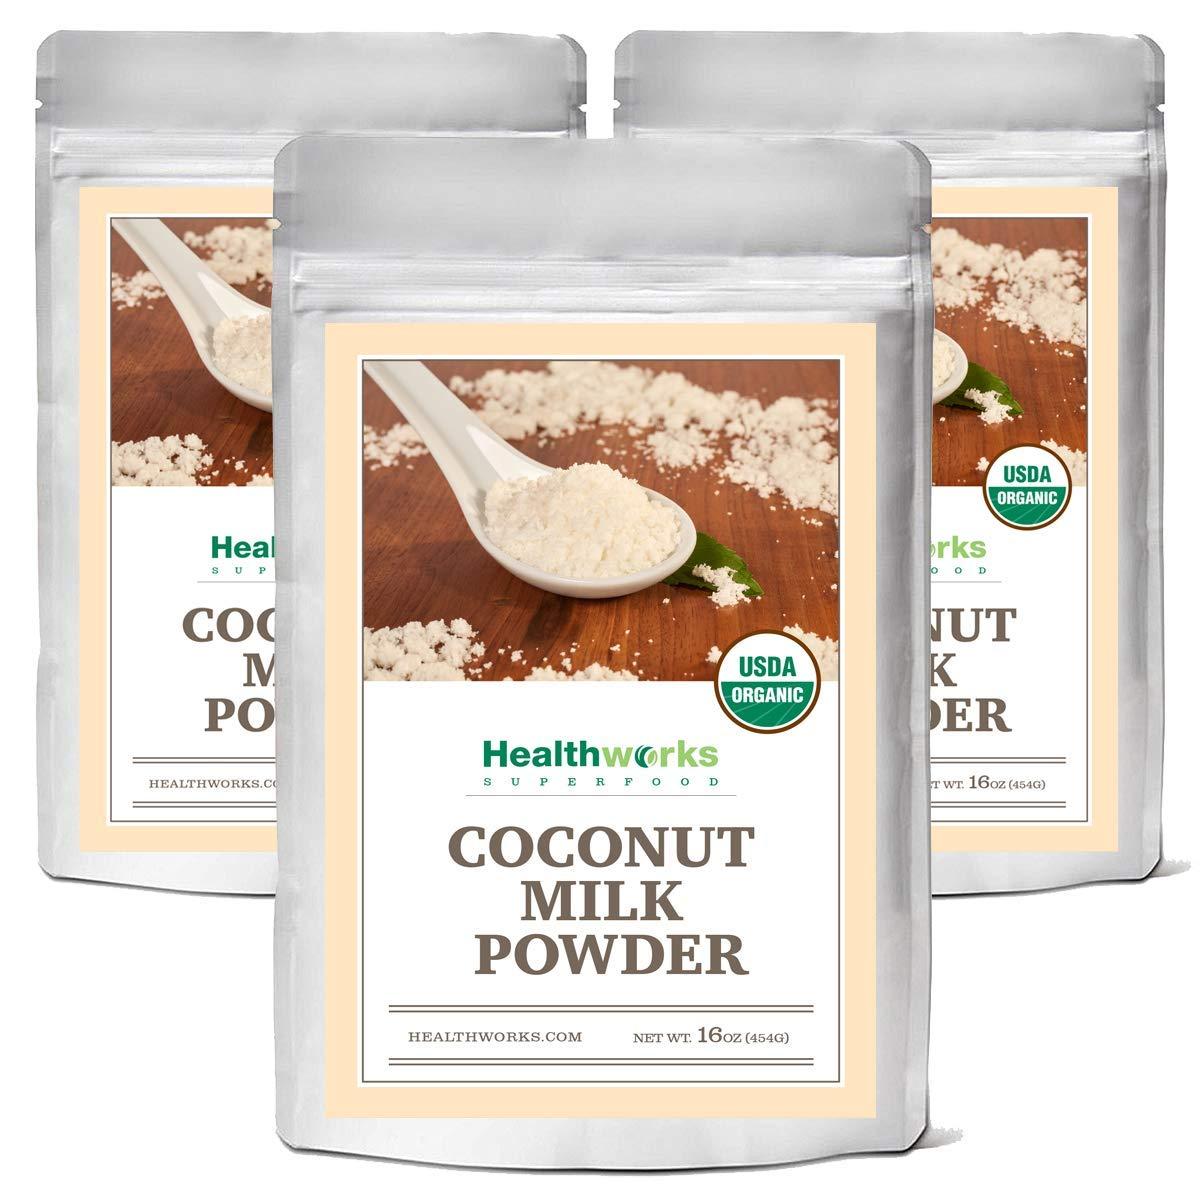 Healthworks Coconut Milk Powder (48 Oz / 3 lb) (3 x 1 lb Bags) | Certified Organic | All-Natural, Creamy, Dairy-Free, Soy-Free, Paleo Diet, Vegan & Non-GMO